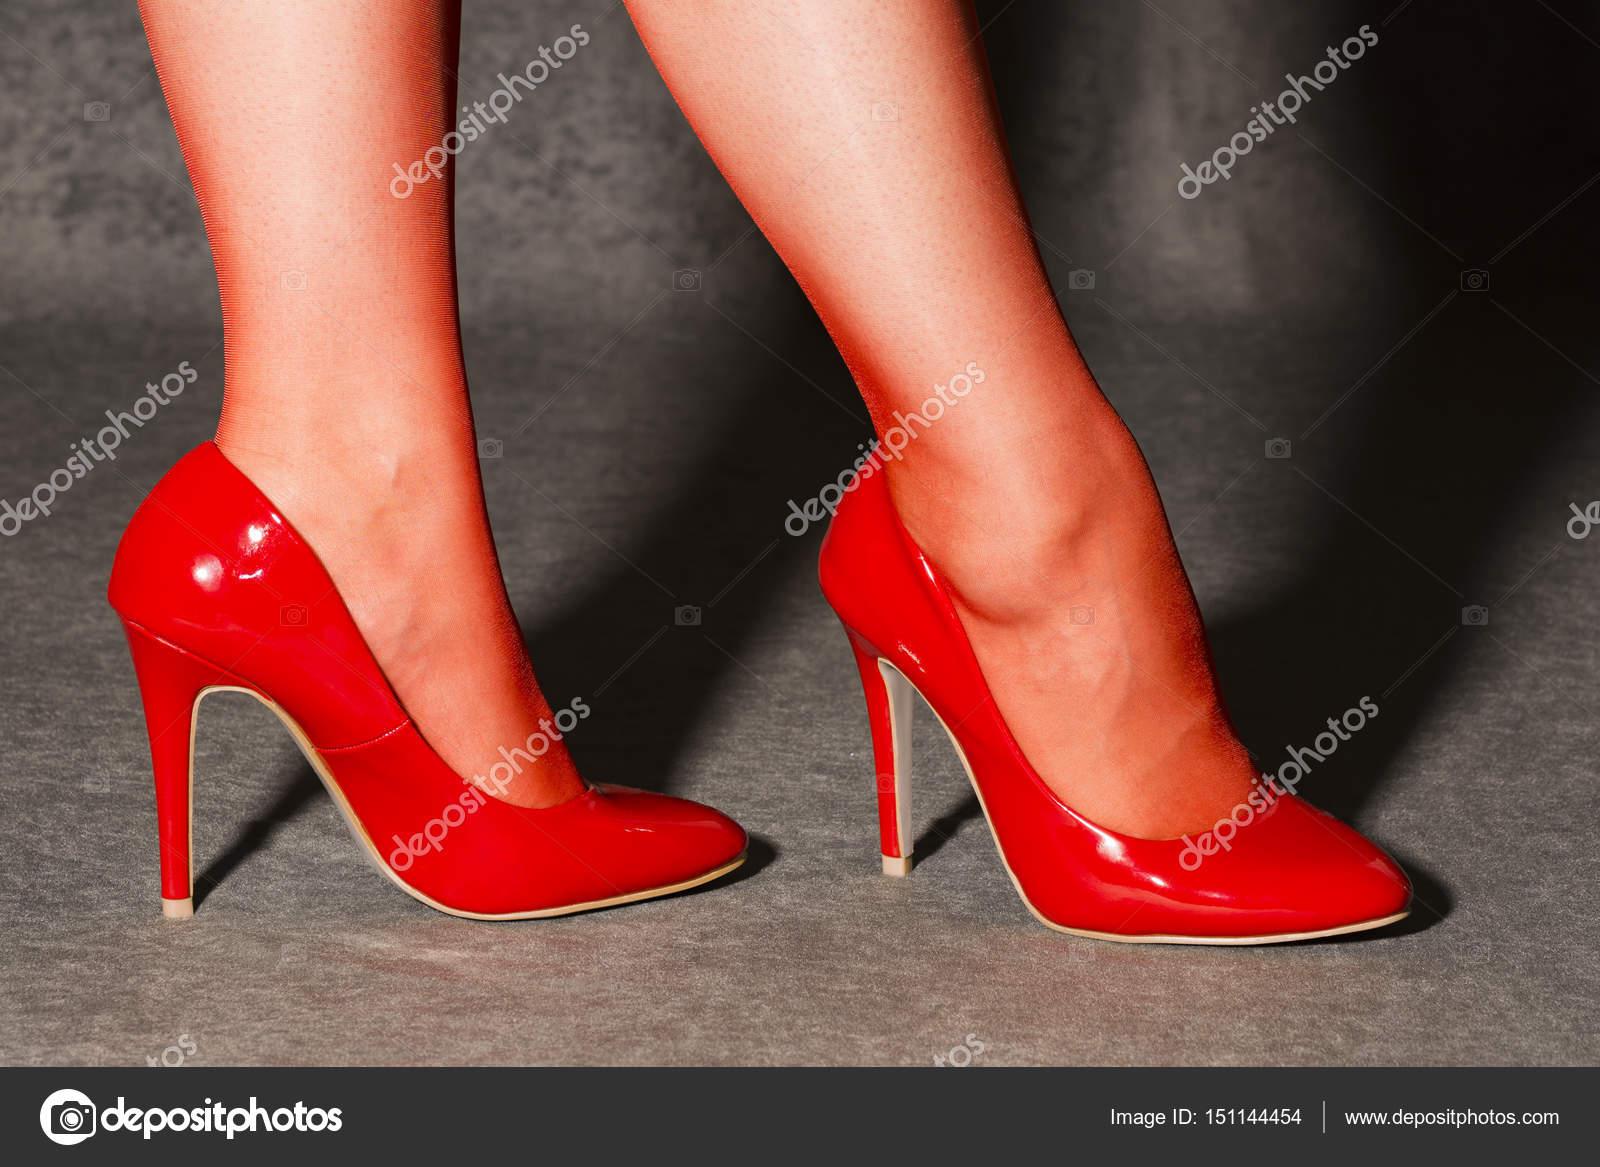 Rojos Sexy Zapatos Zapatos Zapatos Rojos Sexy Rojos Rojos Sexy Sexy Zapatos Sexy Zapatos 7xZ1aBqw